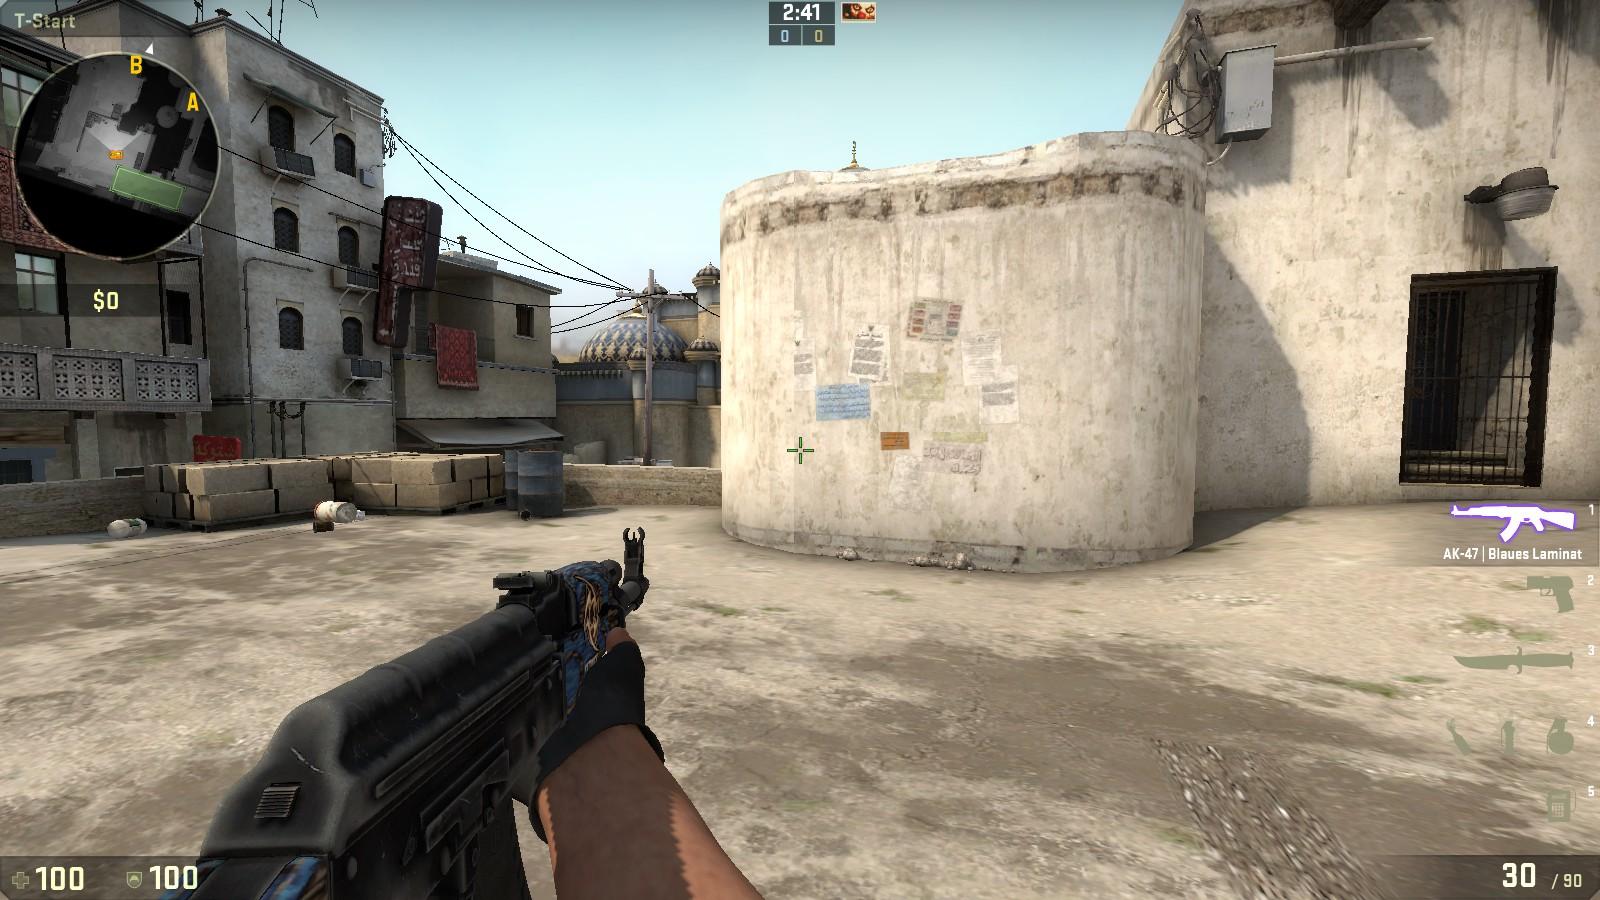 CS:GO left hand view model with AK-47